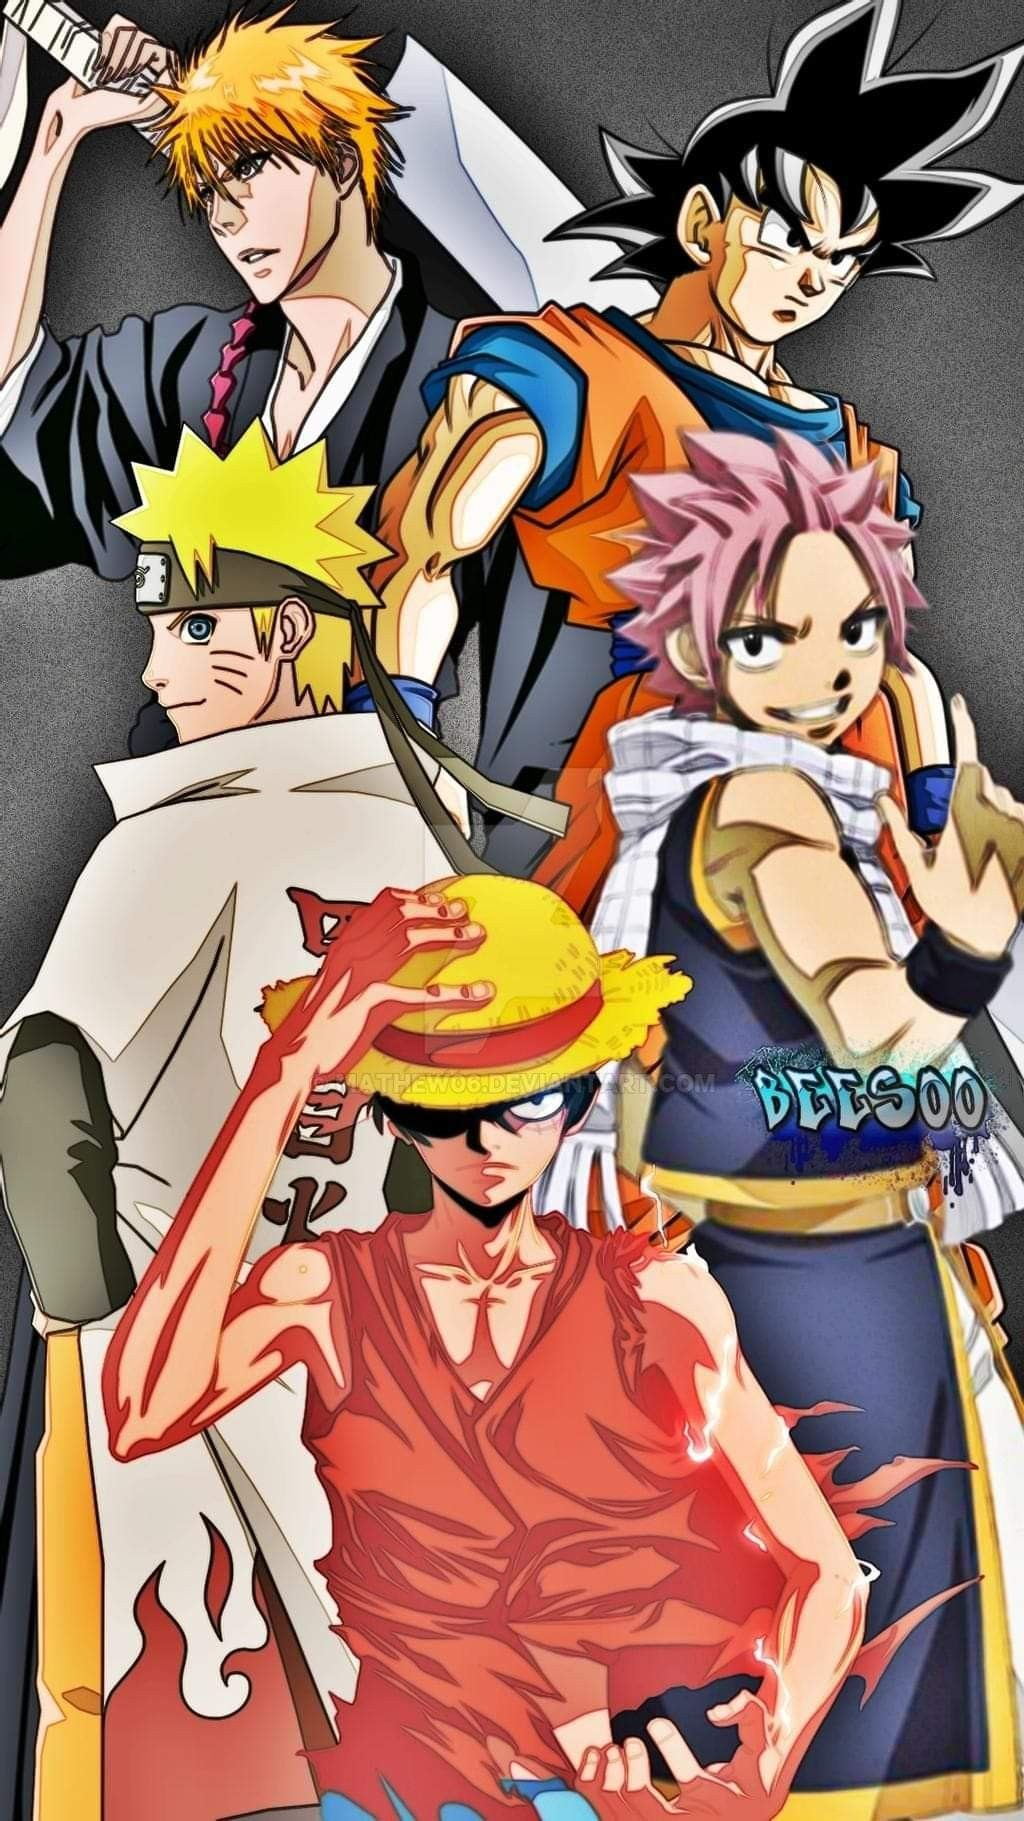 Anime Crossover Hd Wallpaper Anime Crossover Anime Comic Art Anime all in wallpaper